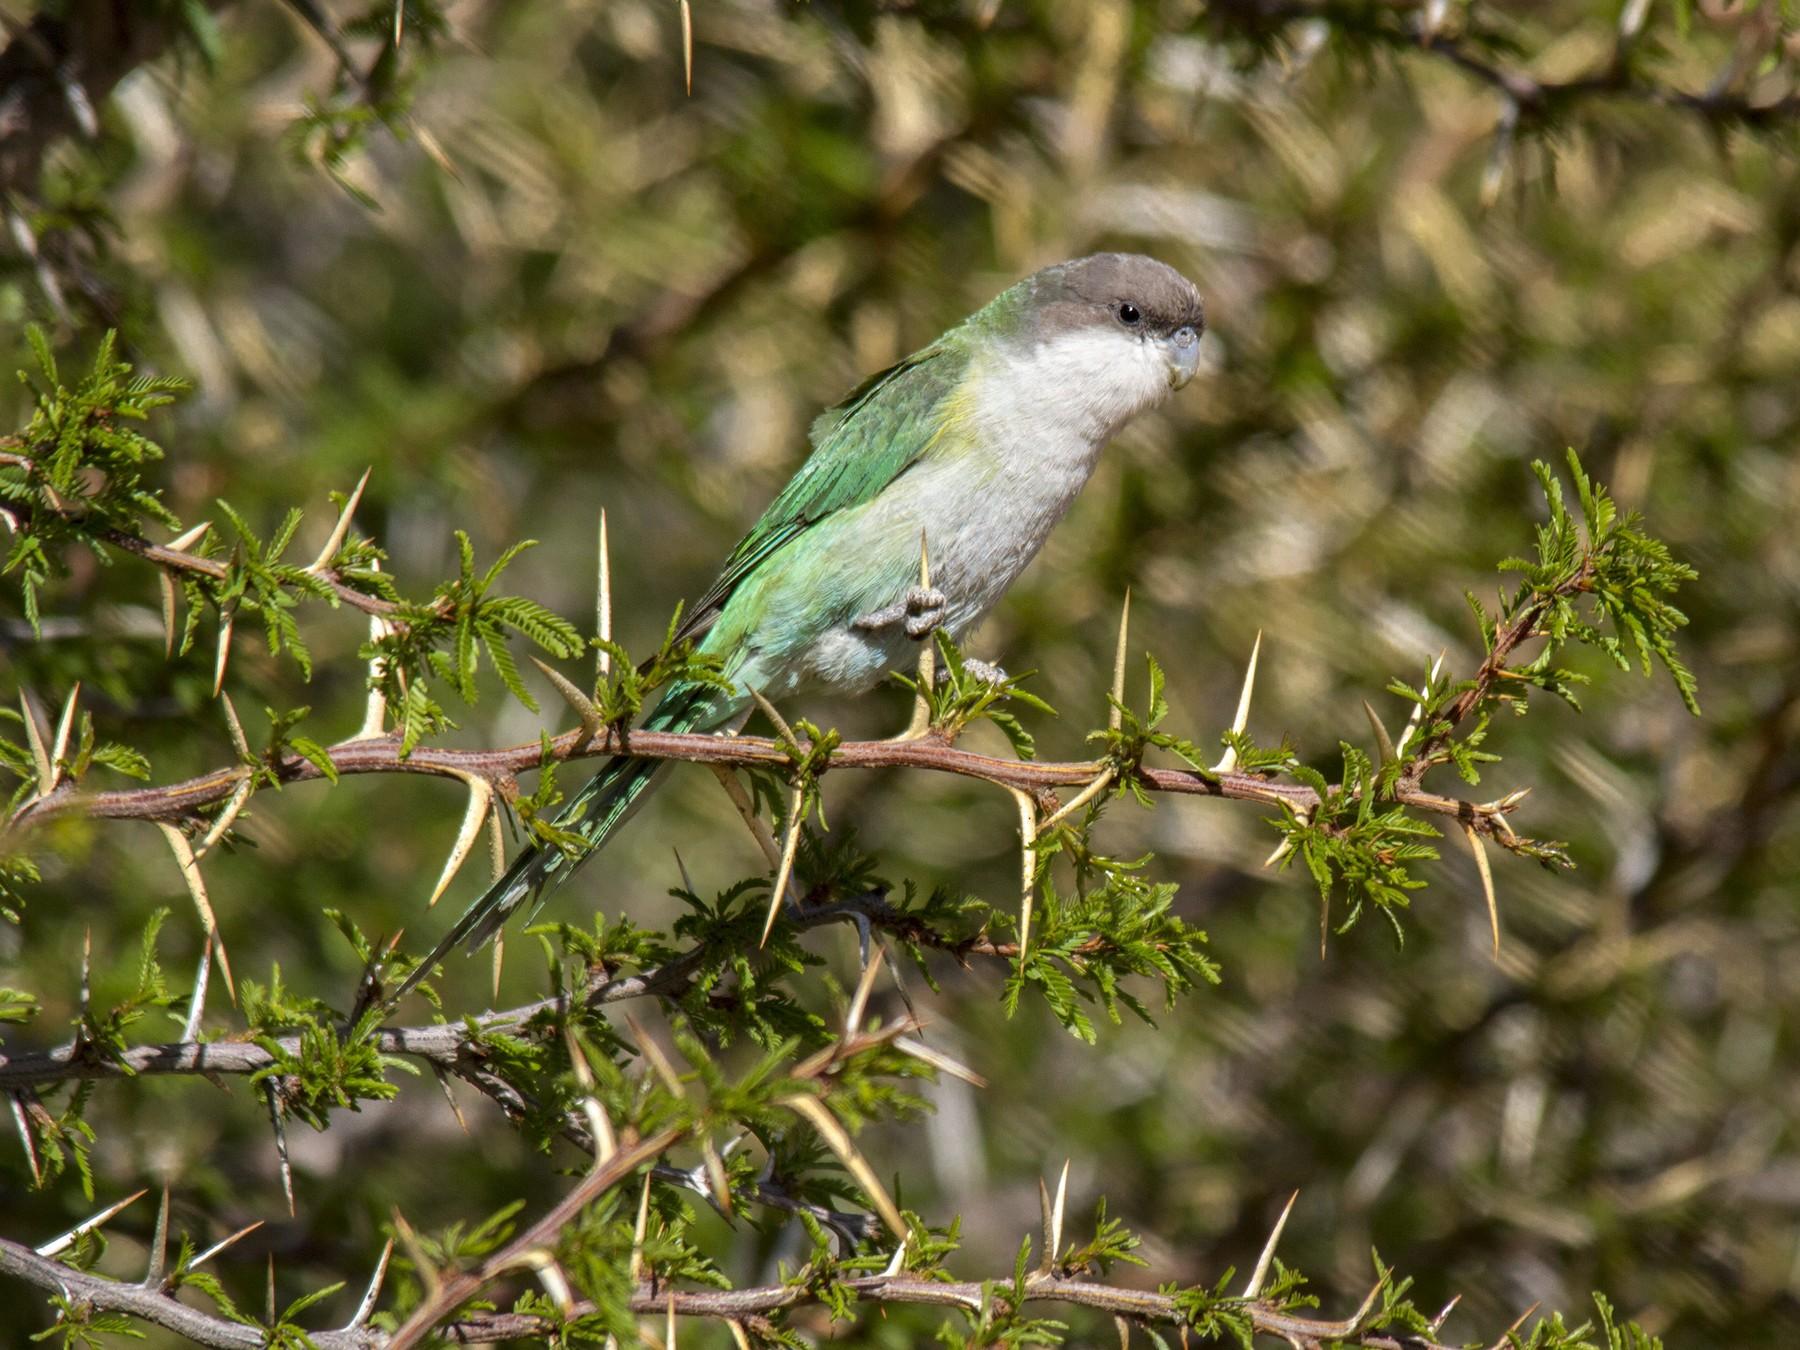 Catita Serrana Grande - Andres Vasquez Noboa - Tropical Birding Tours